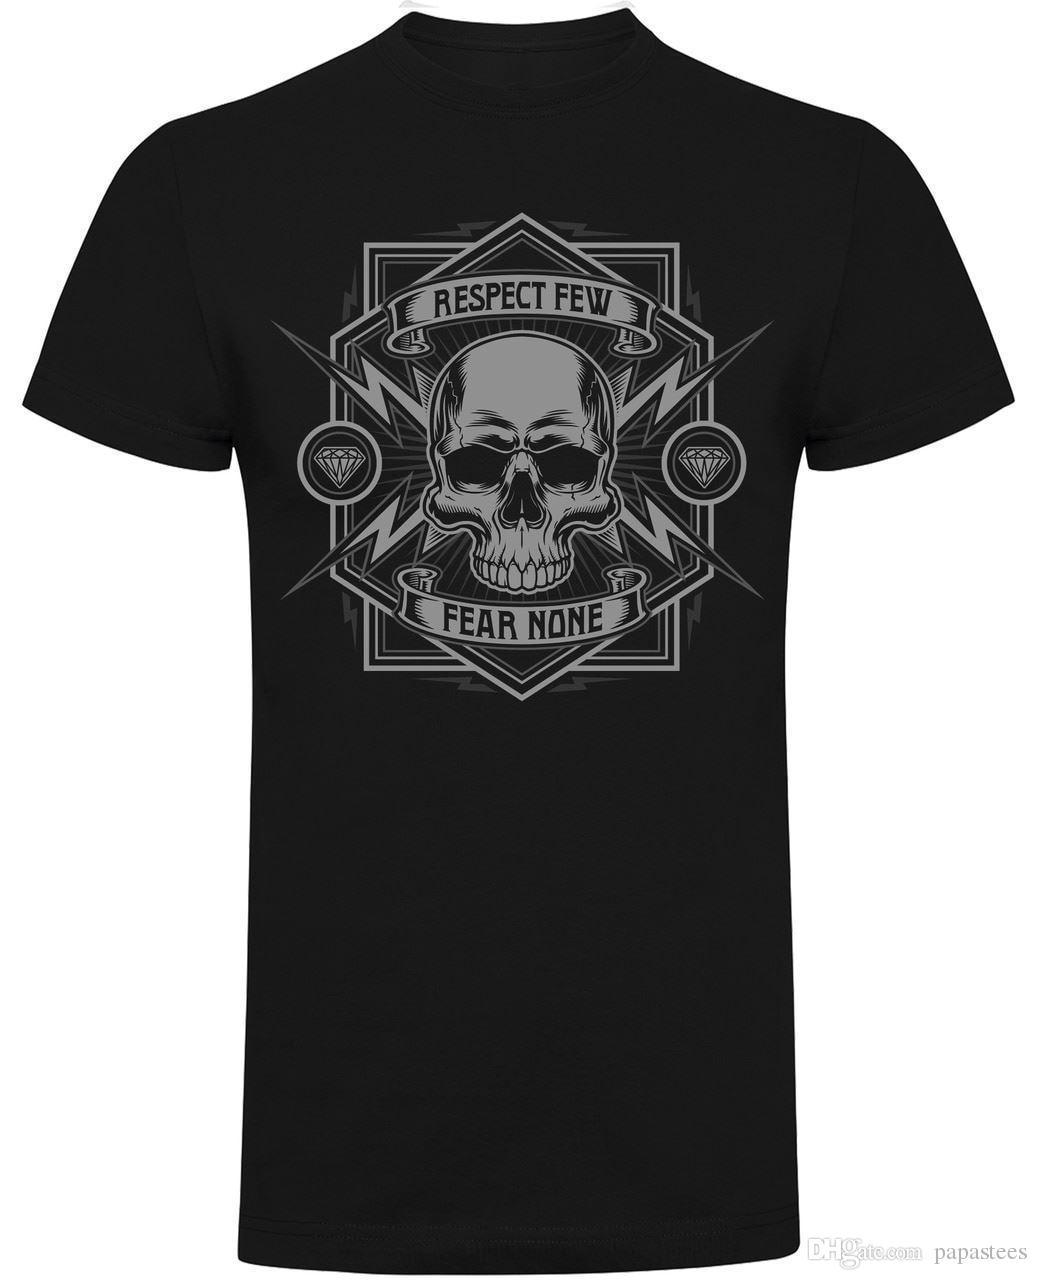 763bd967 Respect Few, Fear None Skull Motorcycle Biker T Shirt Black Shirt Tee Shirt  Shirts From Papastees, $10.64| DHgate.Com